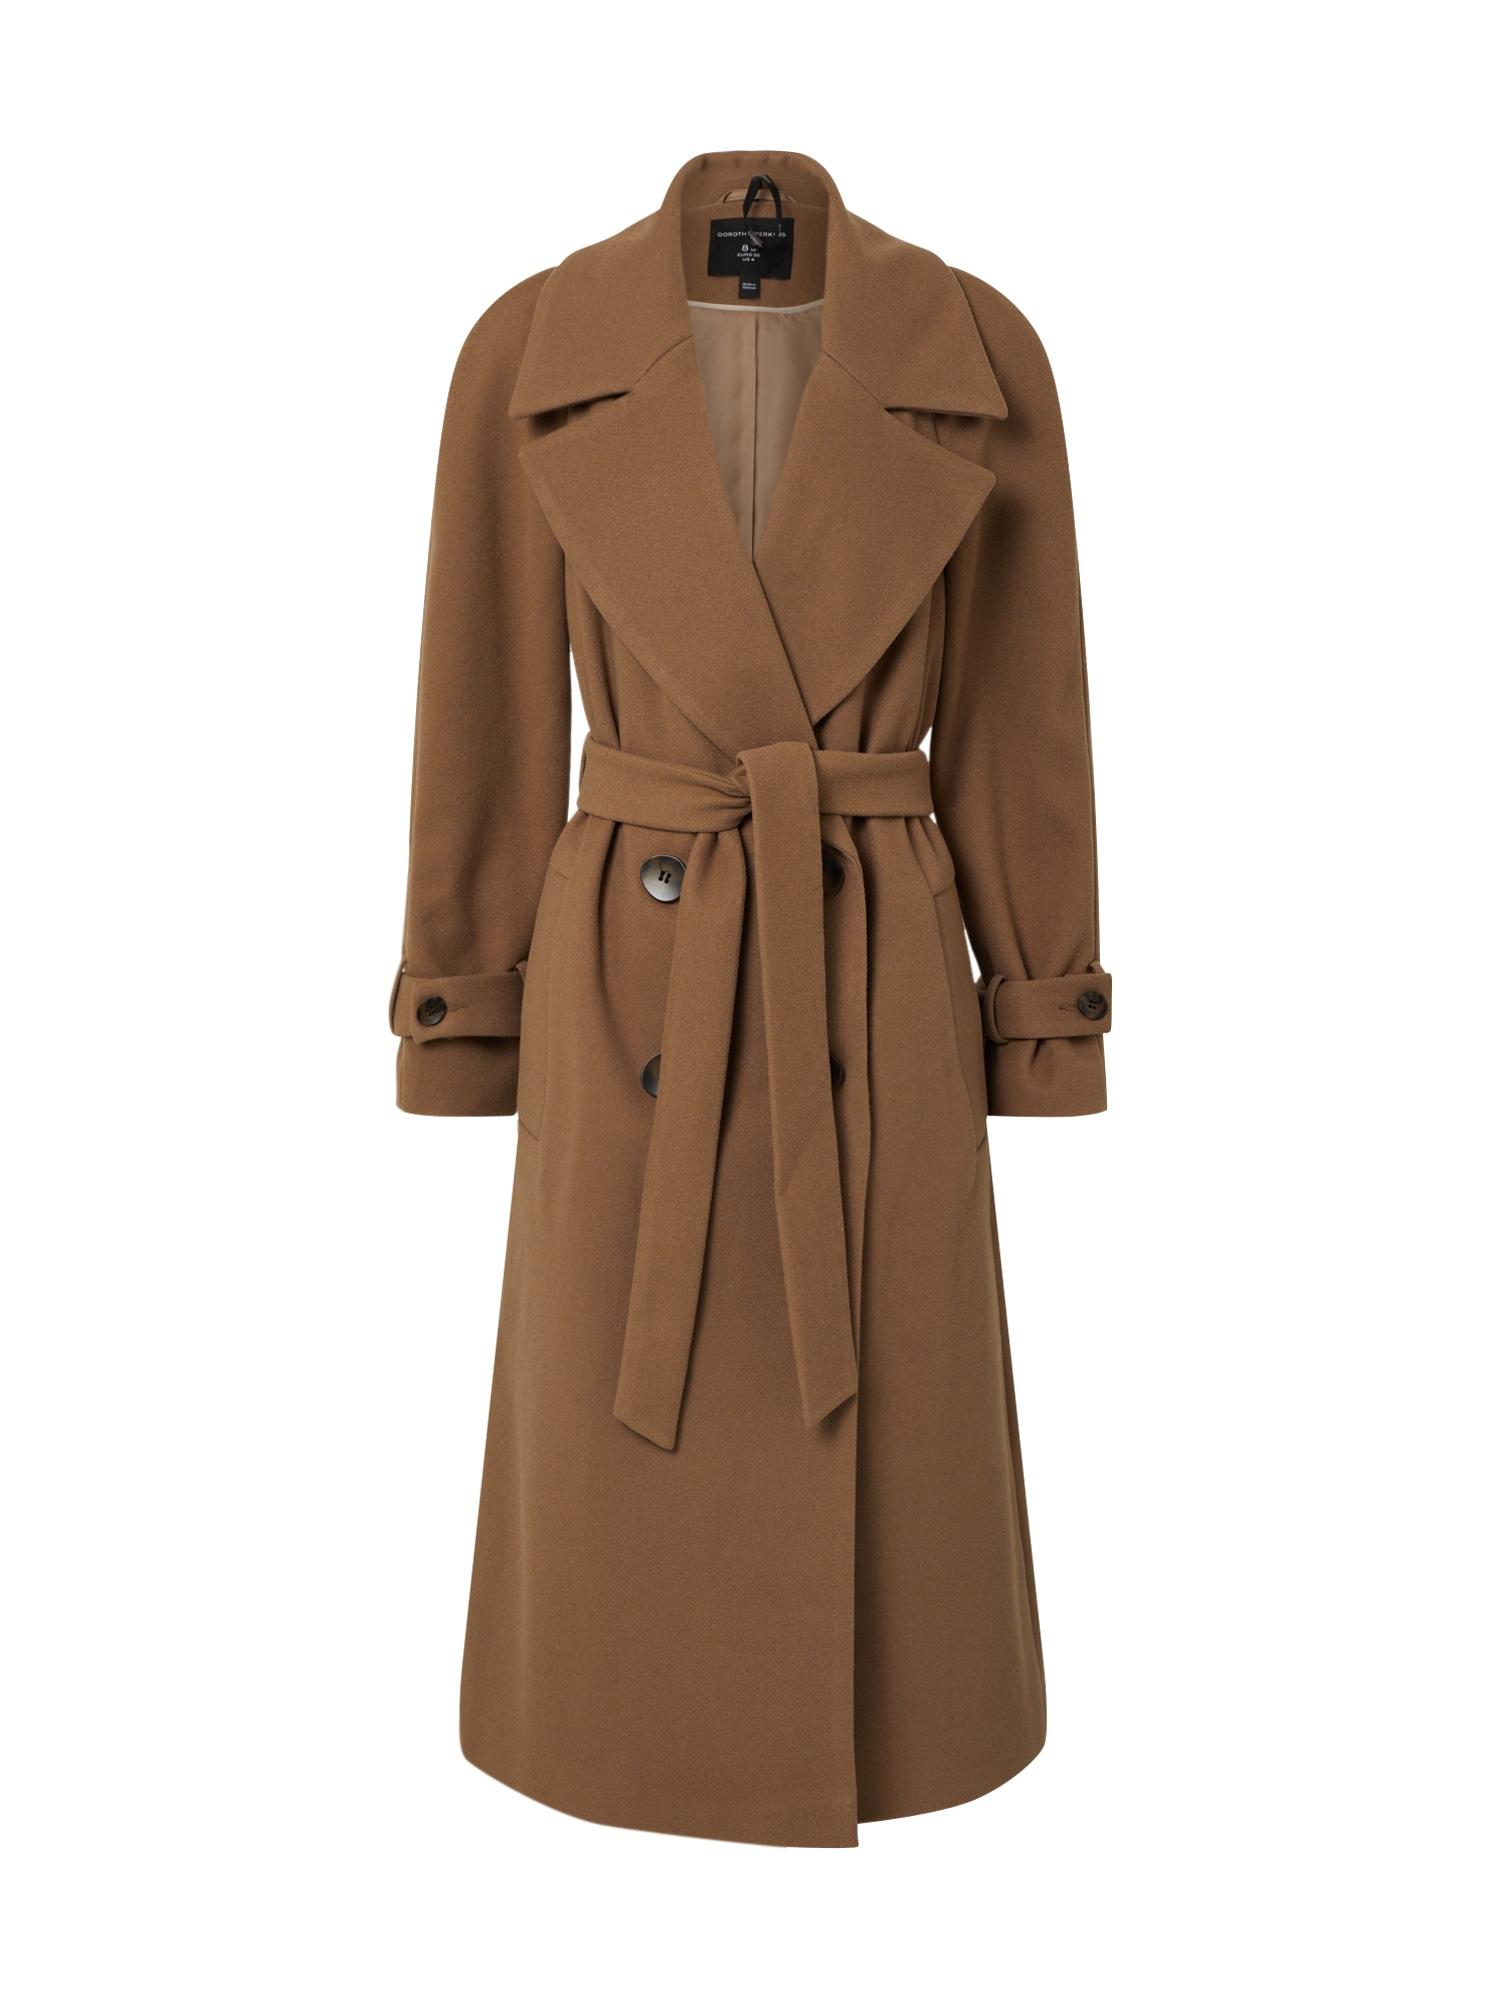 Dorothy Perkins Rudeninis-žieminis paltas 'GREEN DOUBLE BREASTED BELTED WRAP COAT' smėlio